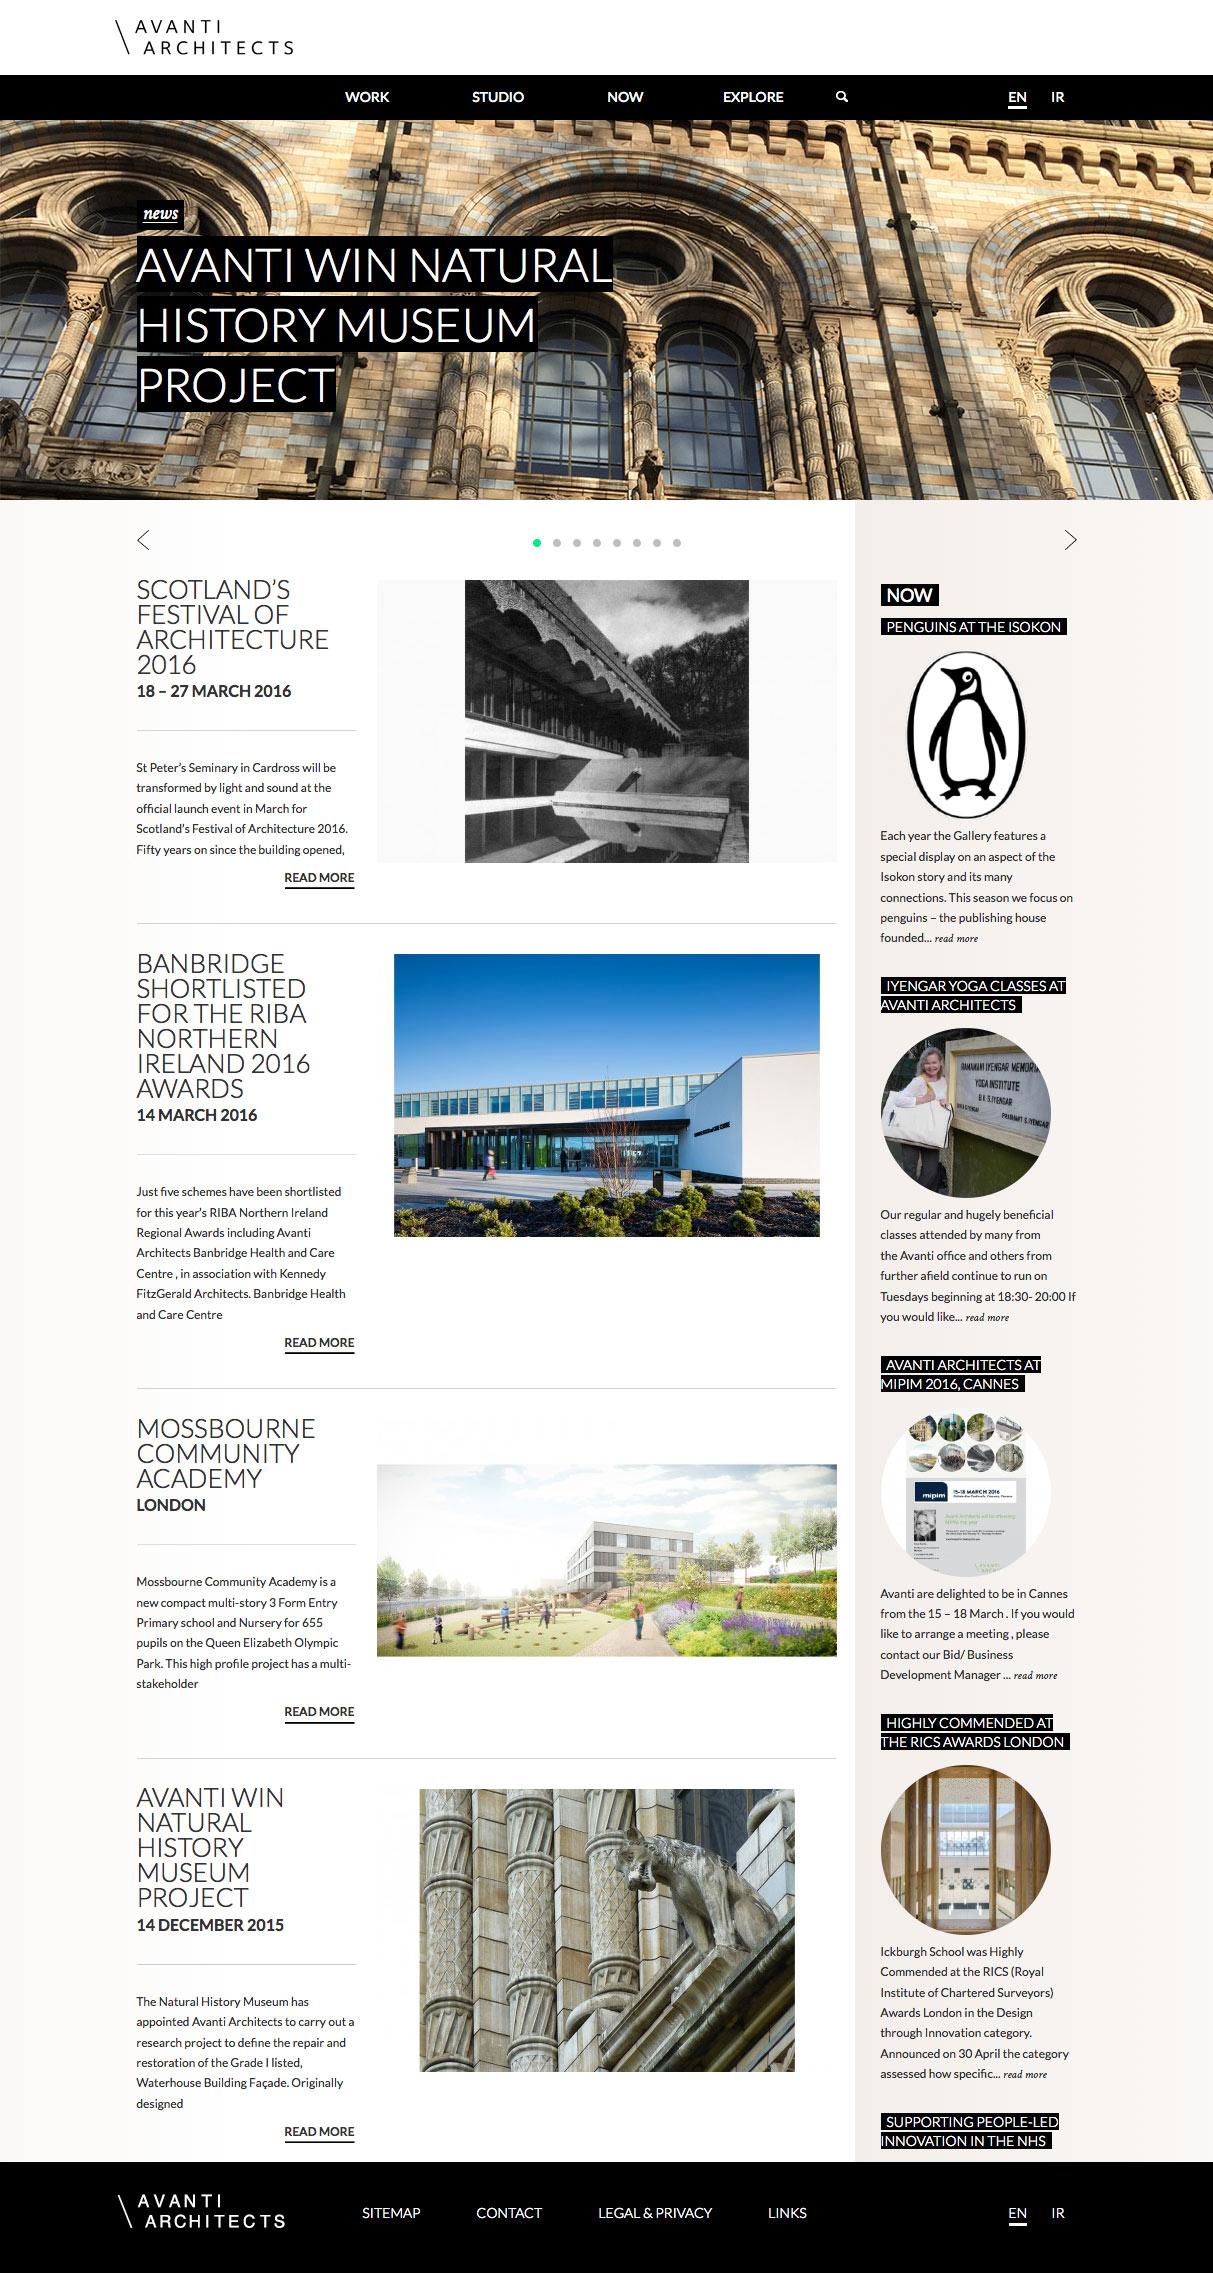 10-Avanti-Architects-I-Architectural-practice